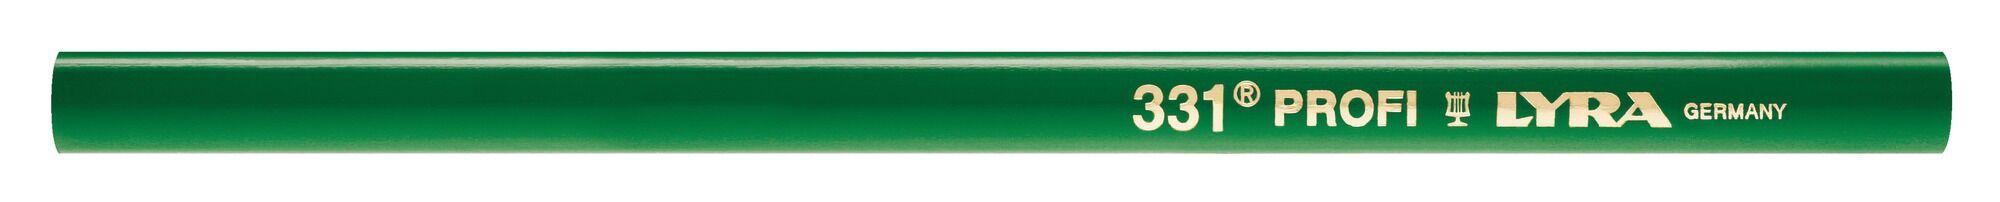 LYRA GERMANY Crayon de maçon vert 30 cm - LYRA - L4313103